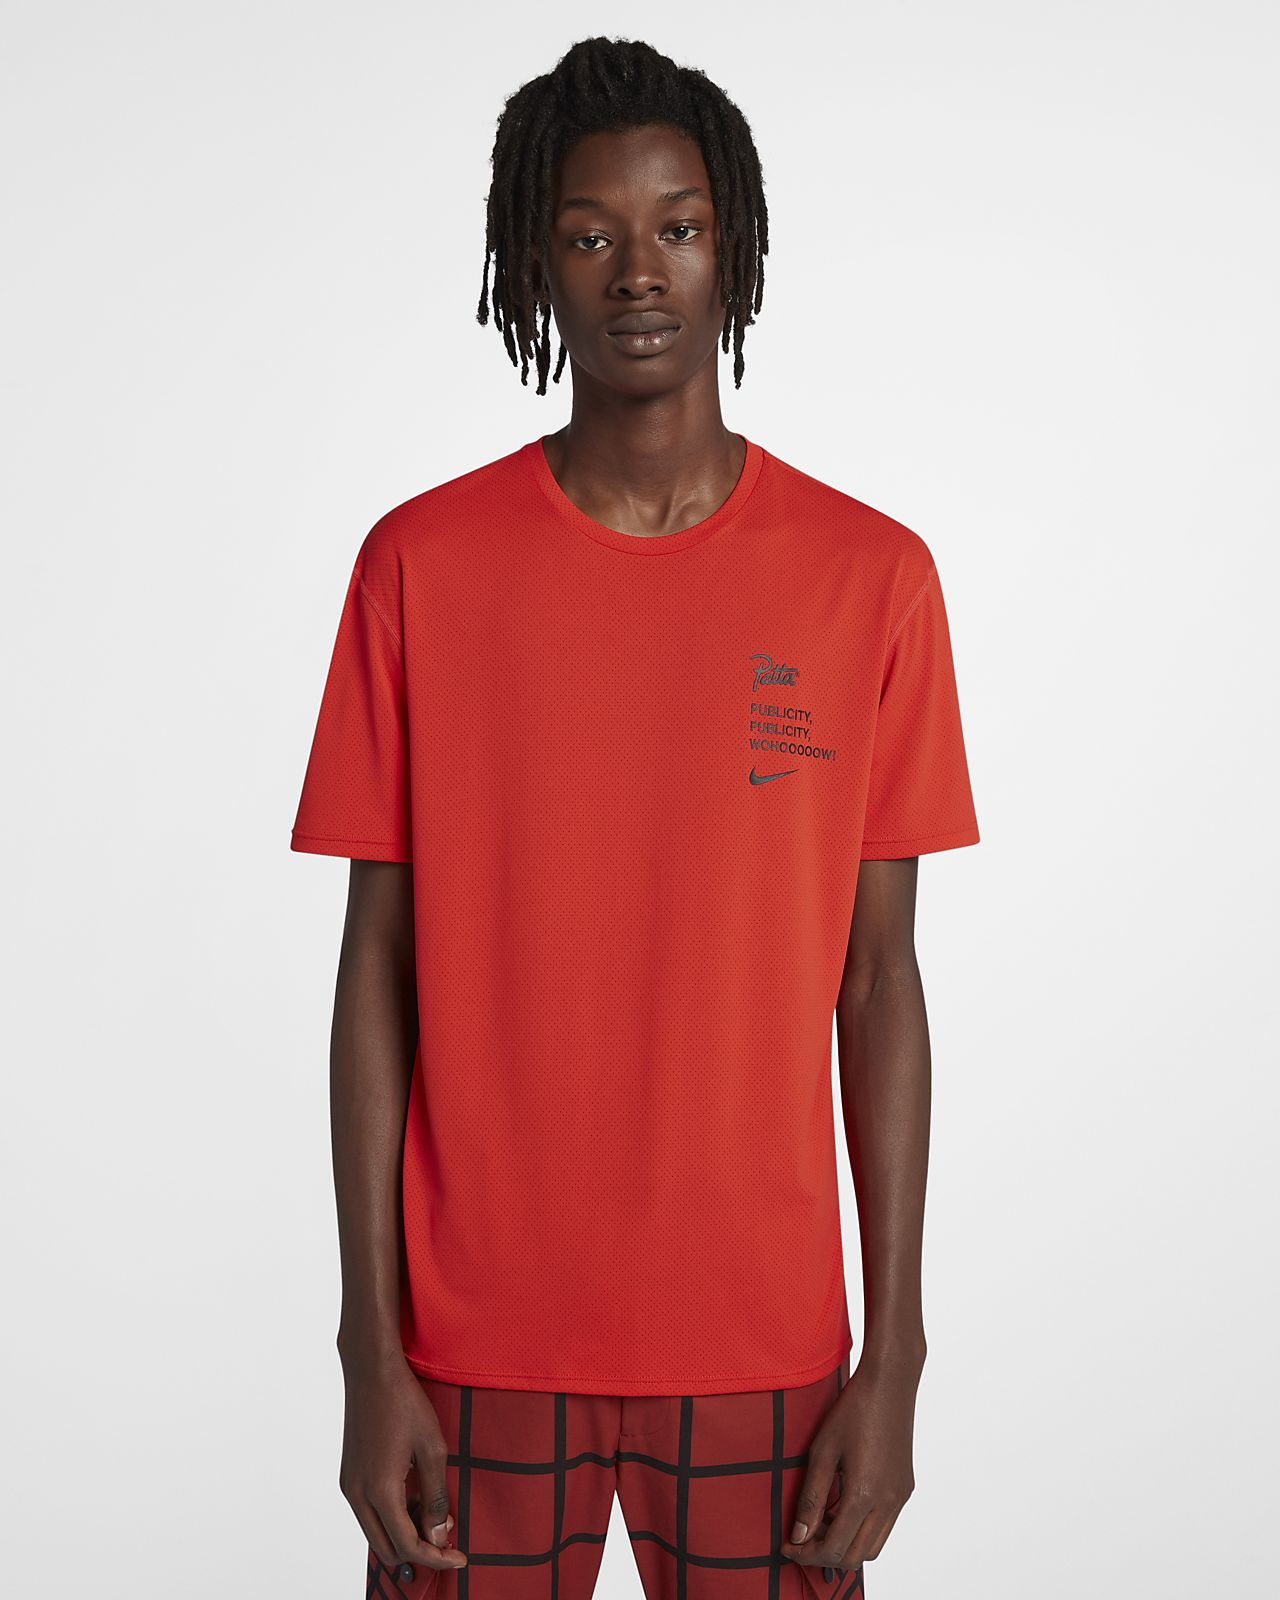 Top de manga corta para hombre Nike x Patta